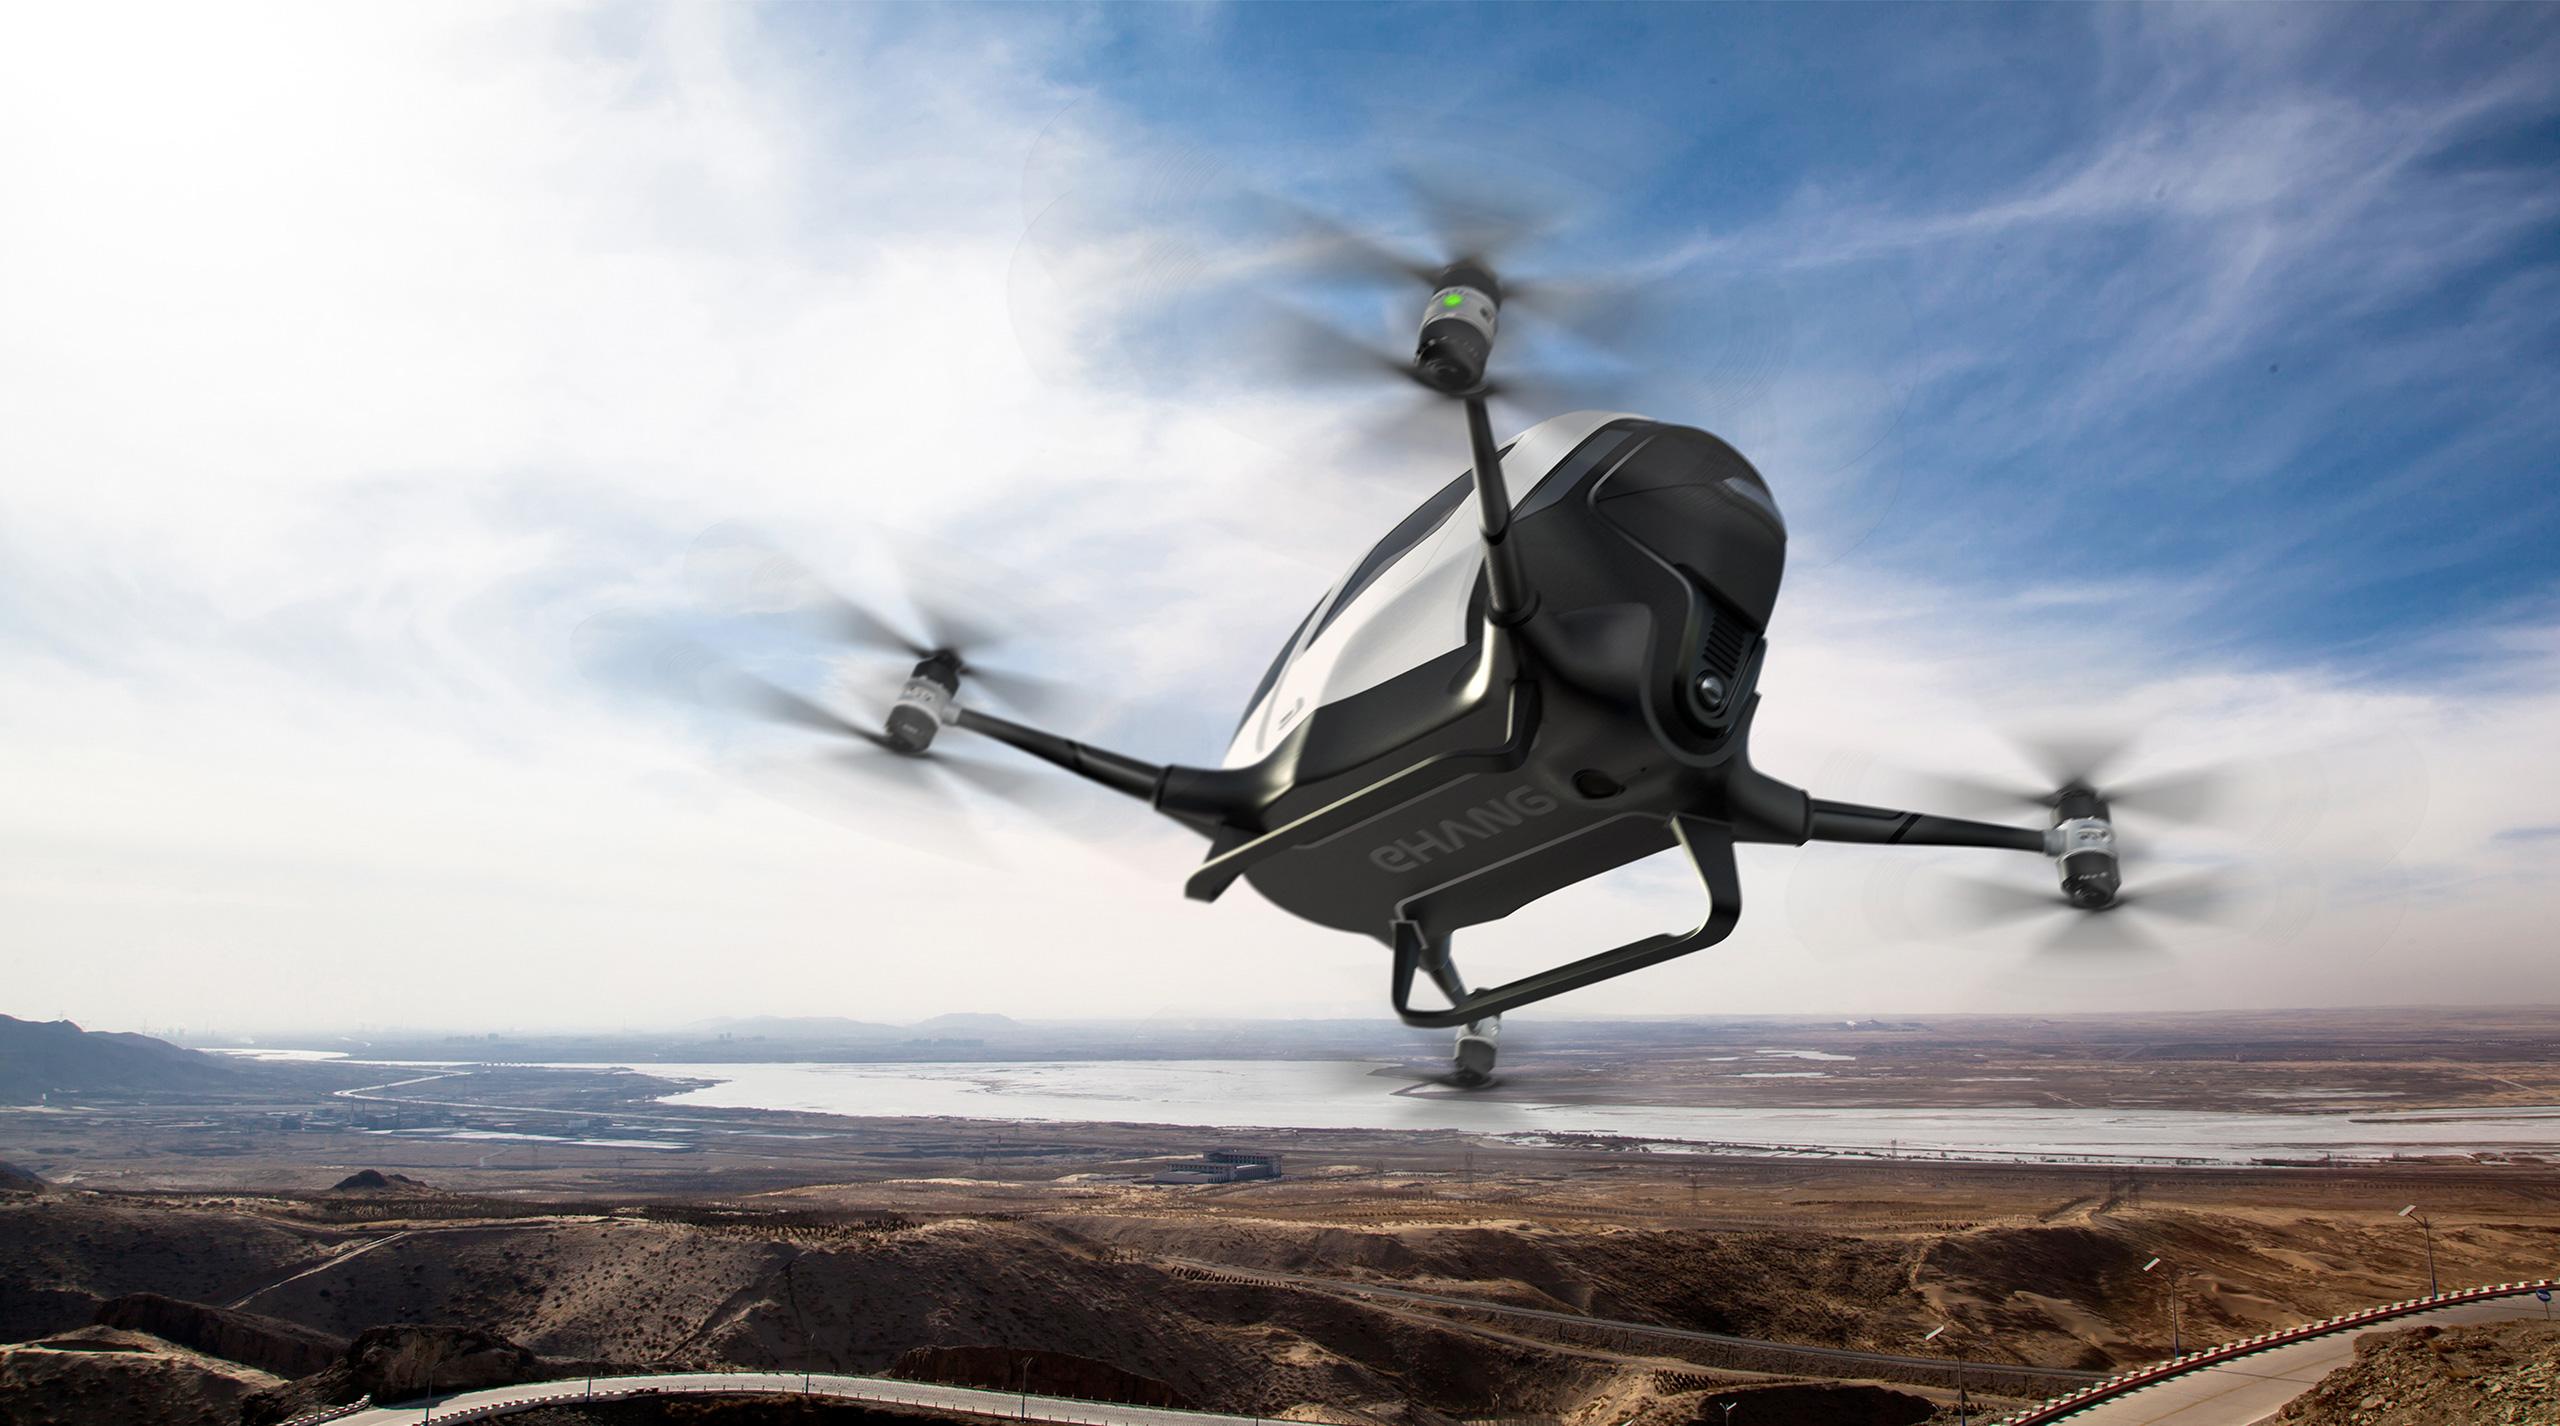 https://s1.cdn.autoevolution.com/images/news/chinese-passenger-drone-makes-maiden-flight-123351_1.jpg